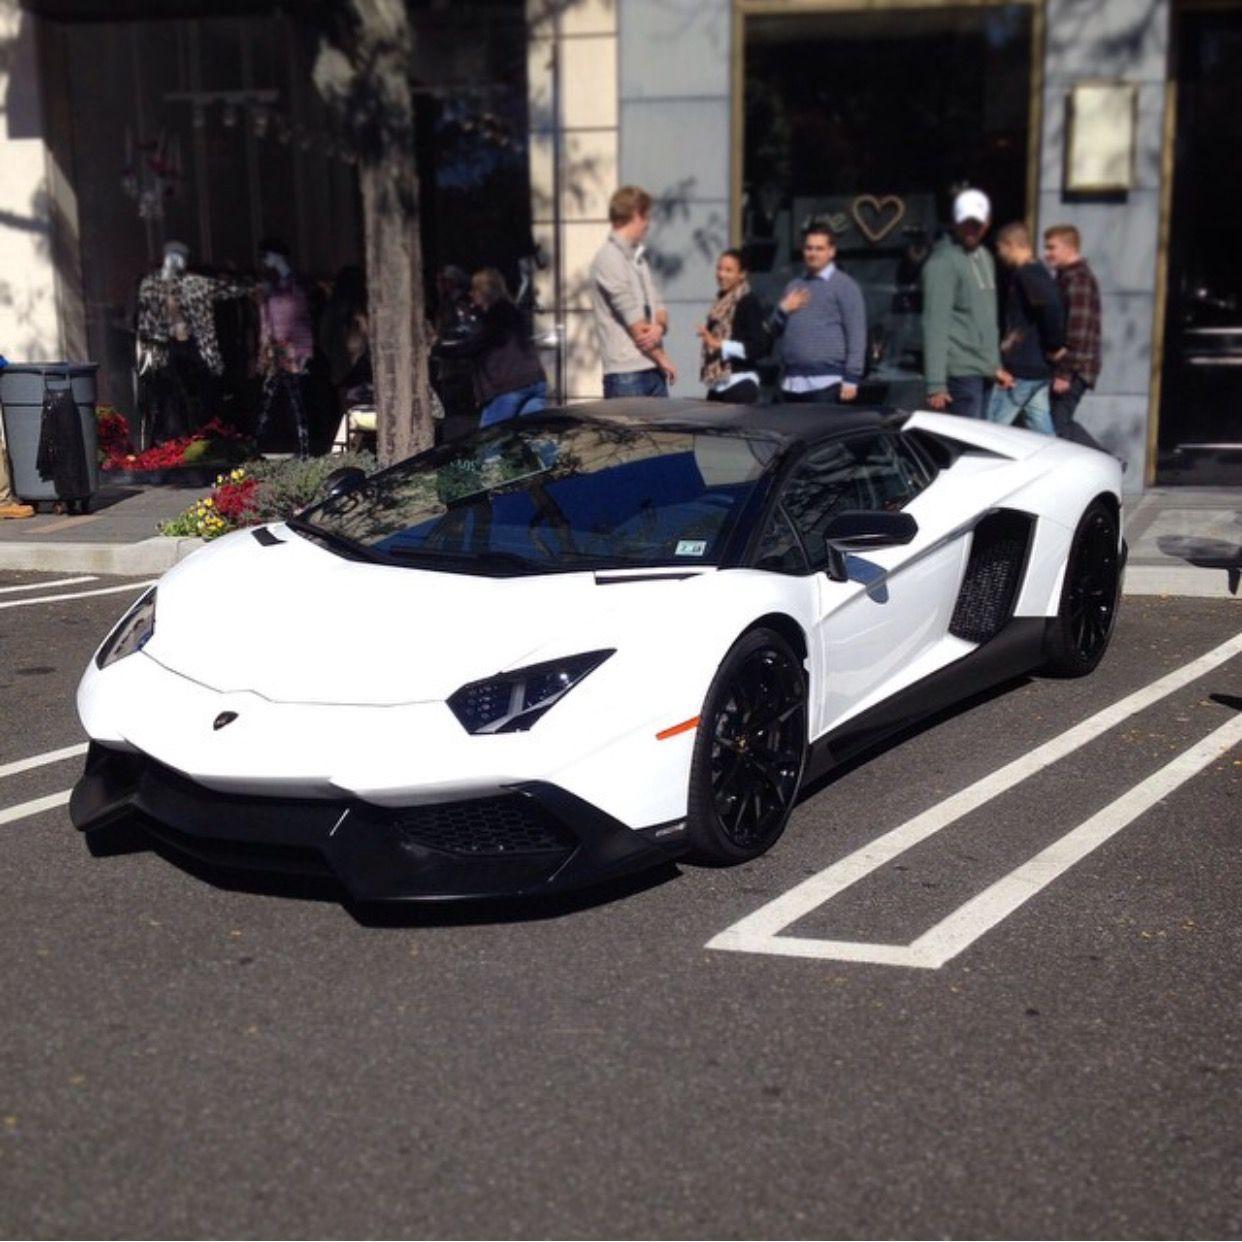 Lamborghini 50° Anniversario Edition Aventador Roadster painted in on tyga gold audi, tyga lamborghini crash, tyga and chris brown lamborghini aventador, tyga crashes his lamborghini,